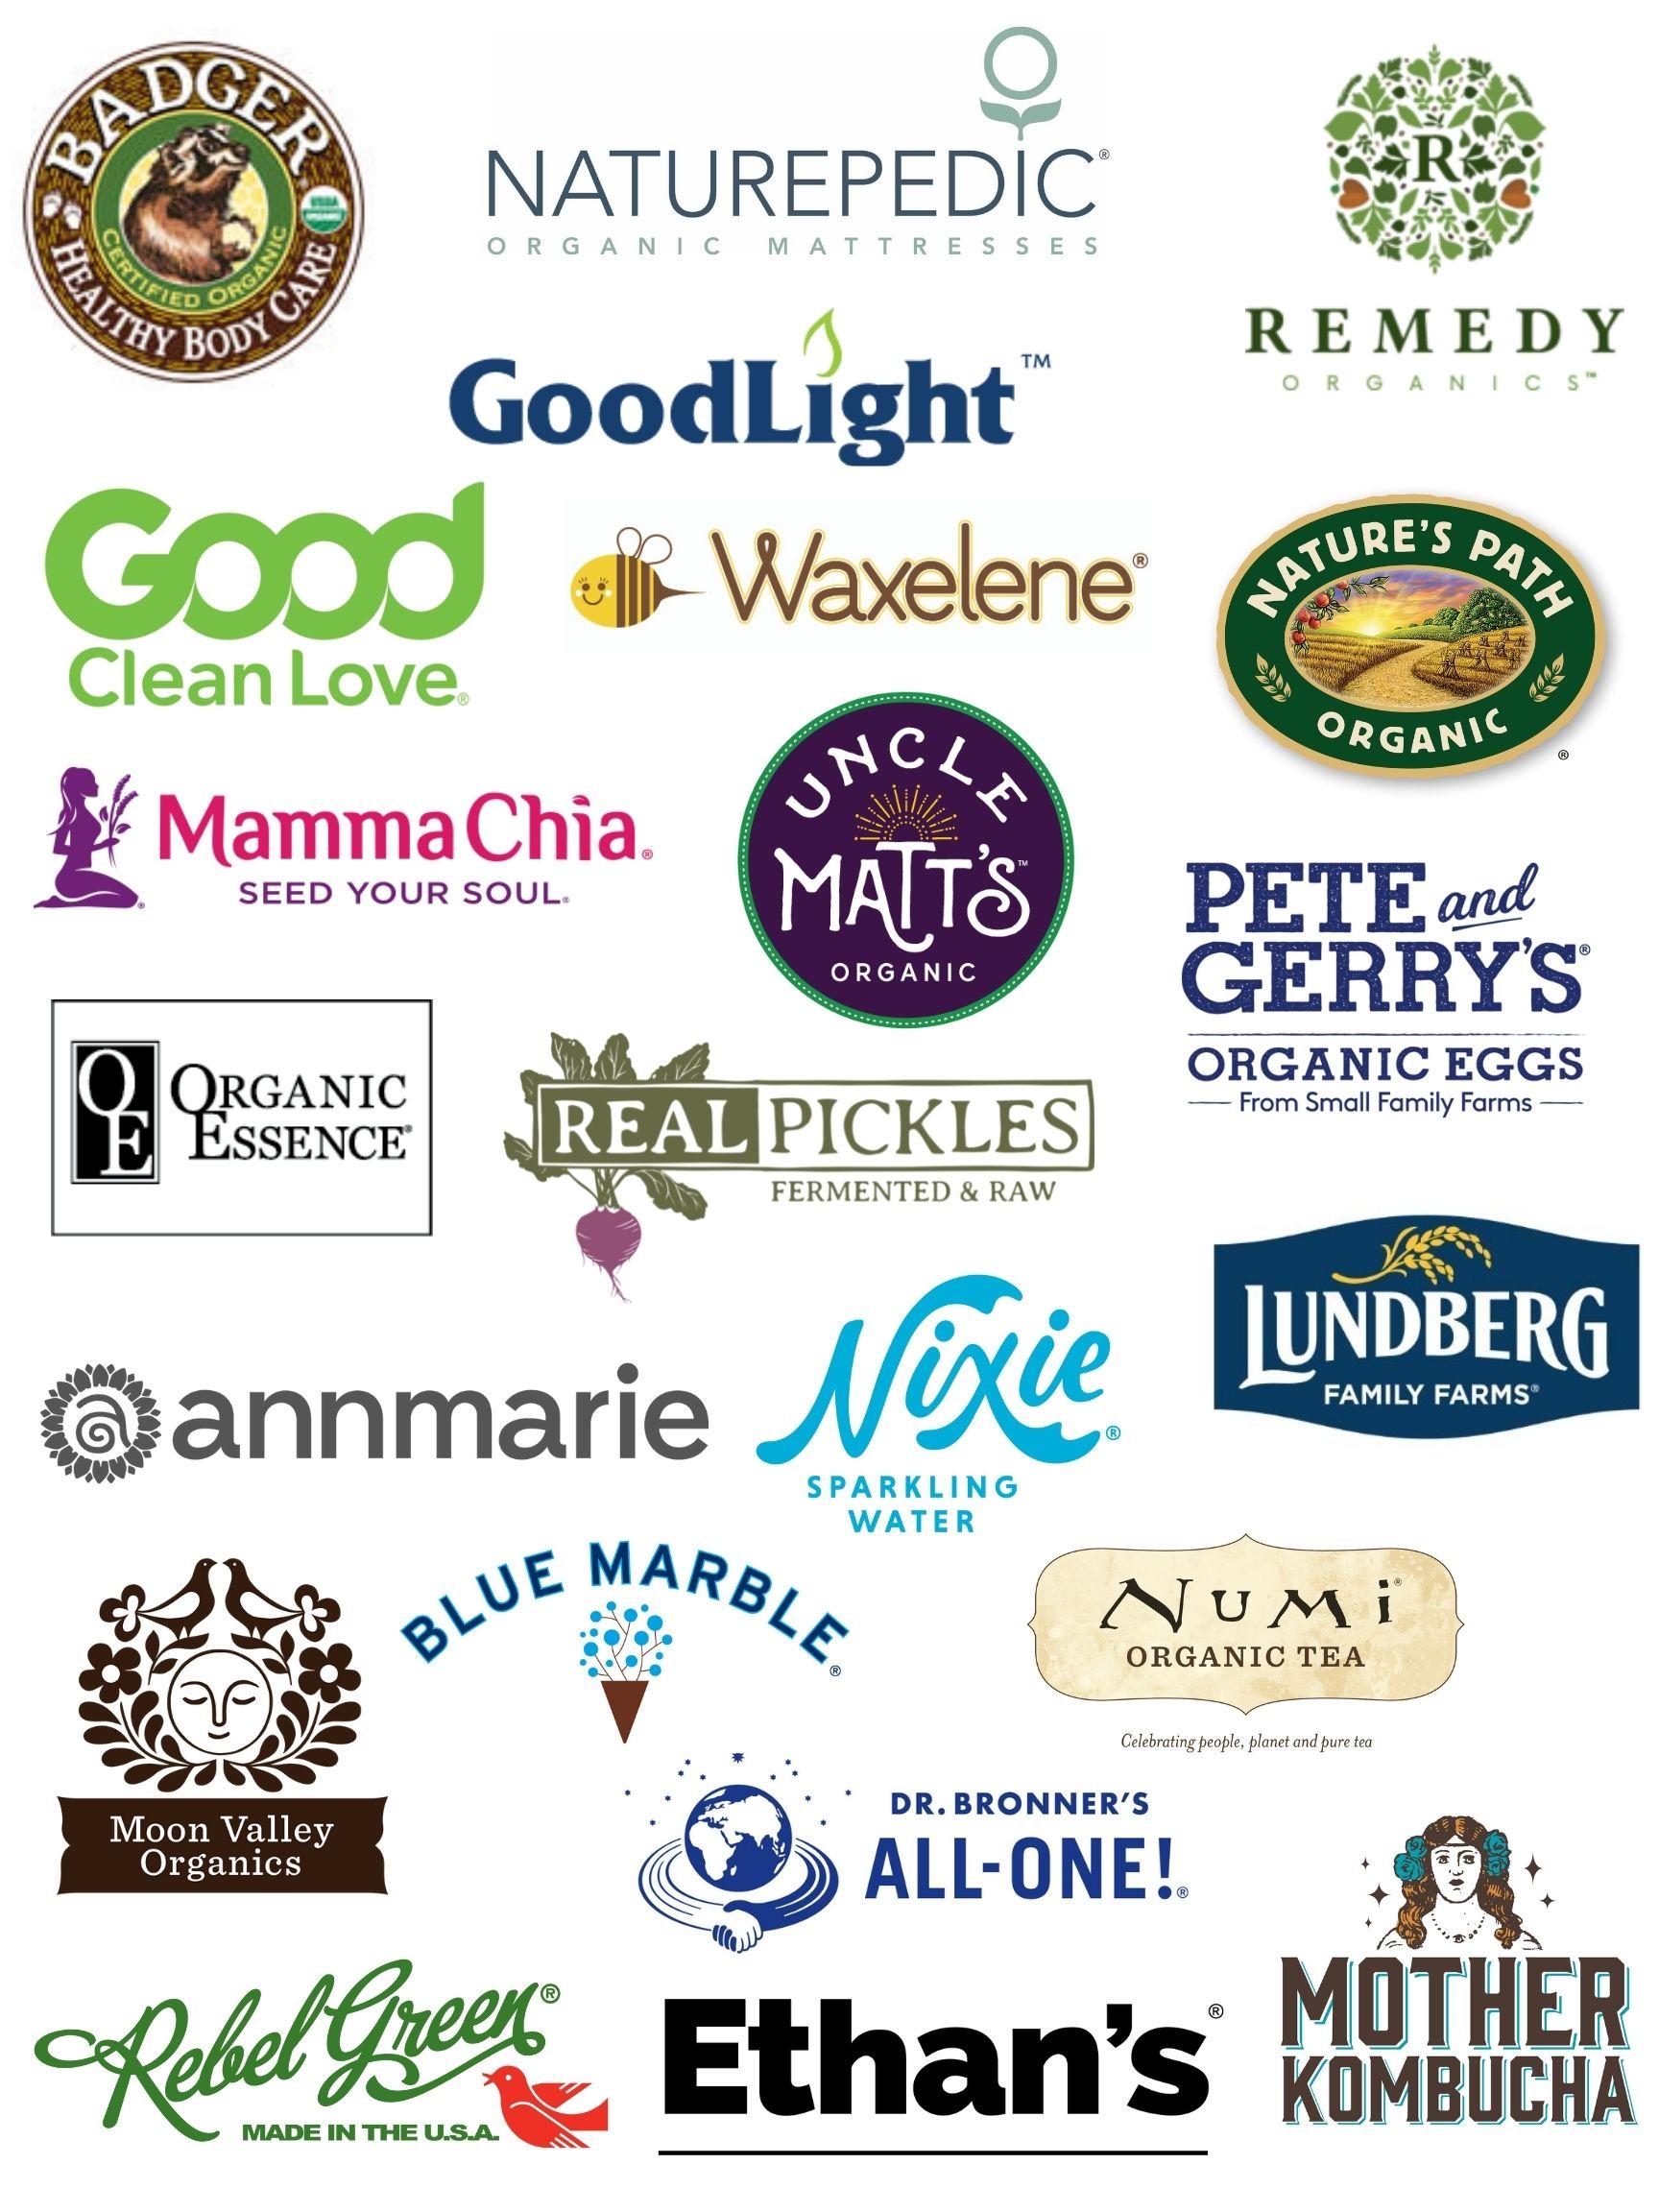 POB Brands Logos (1)